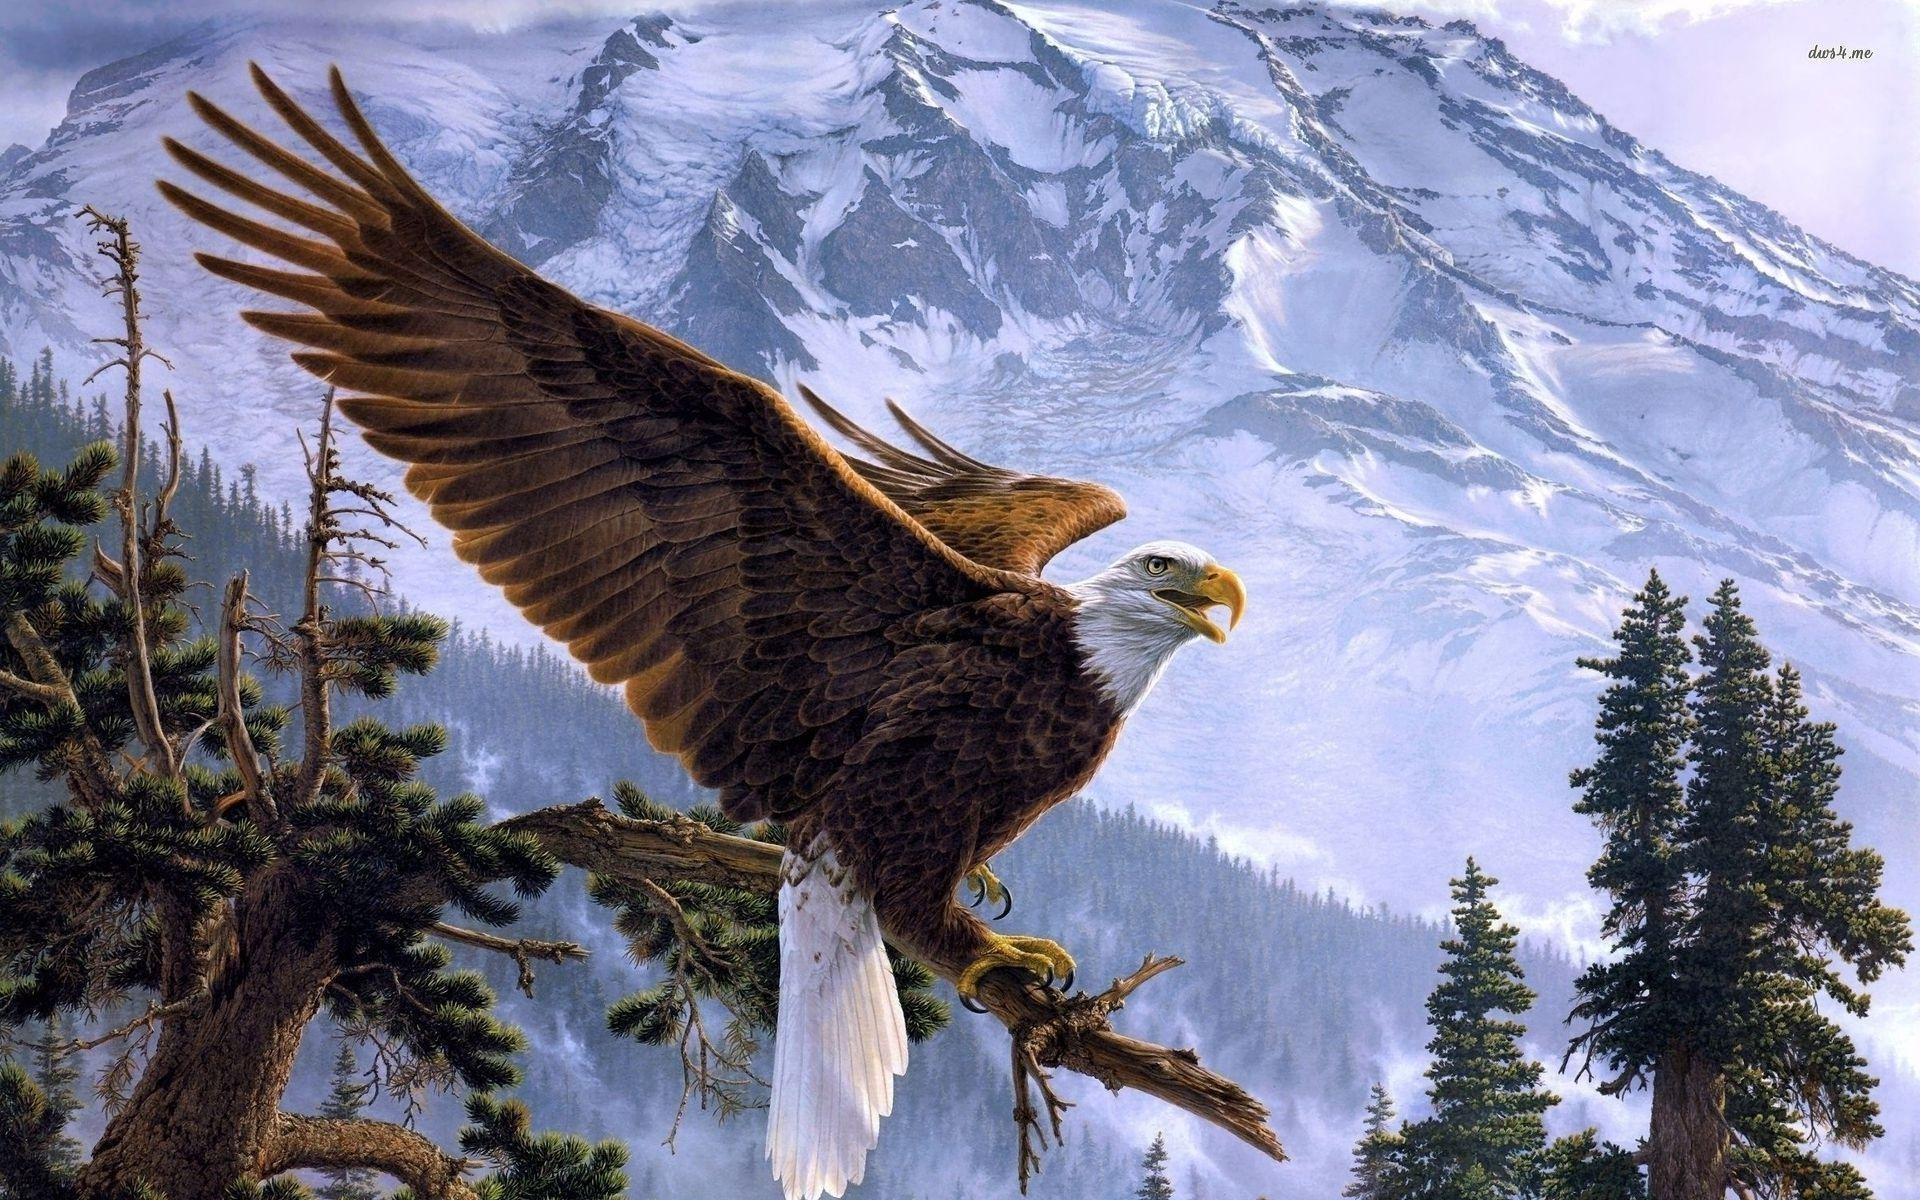 related bald eagle background - photo #29